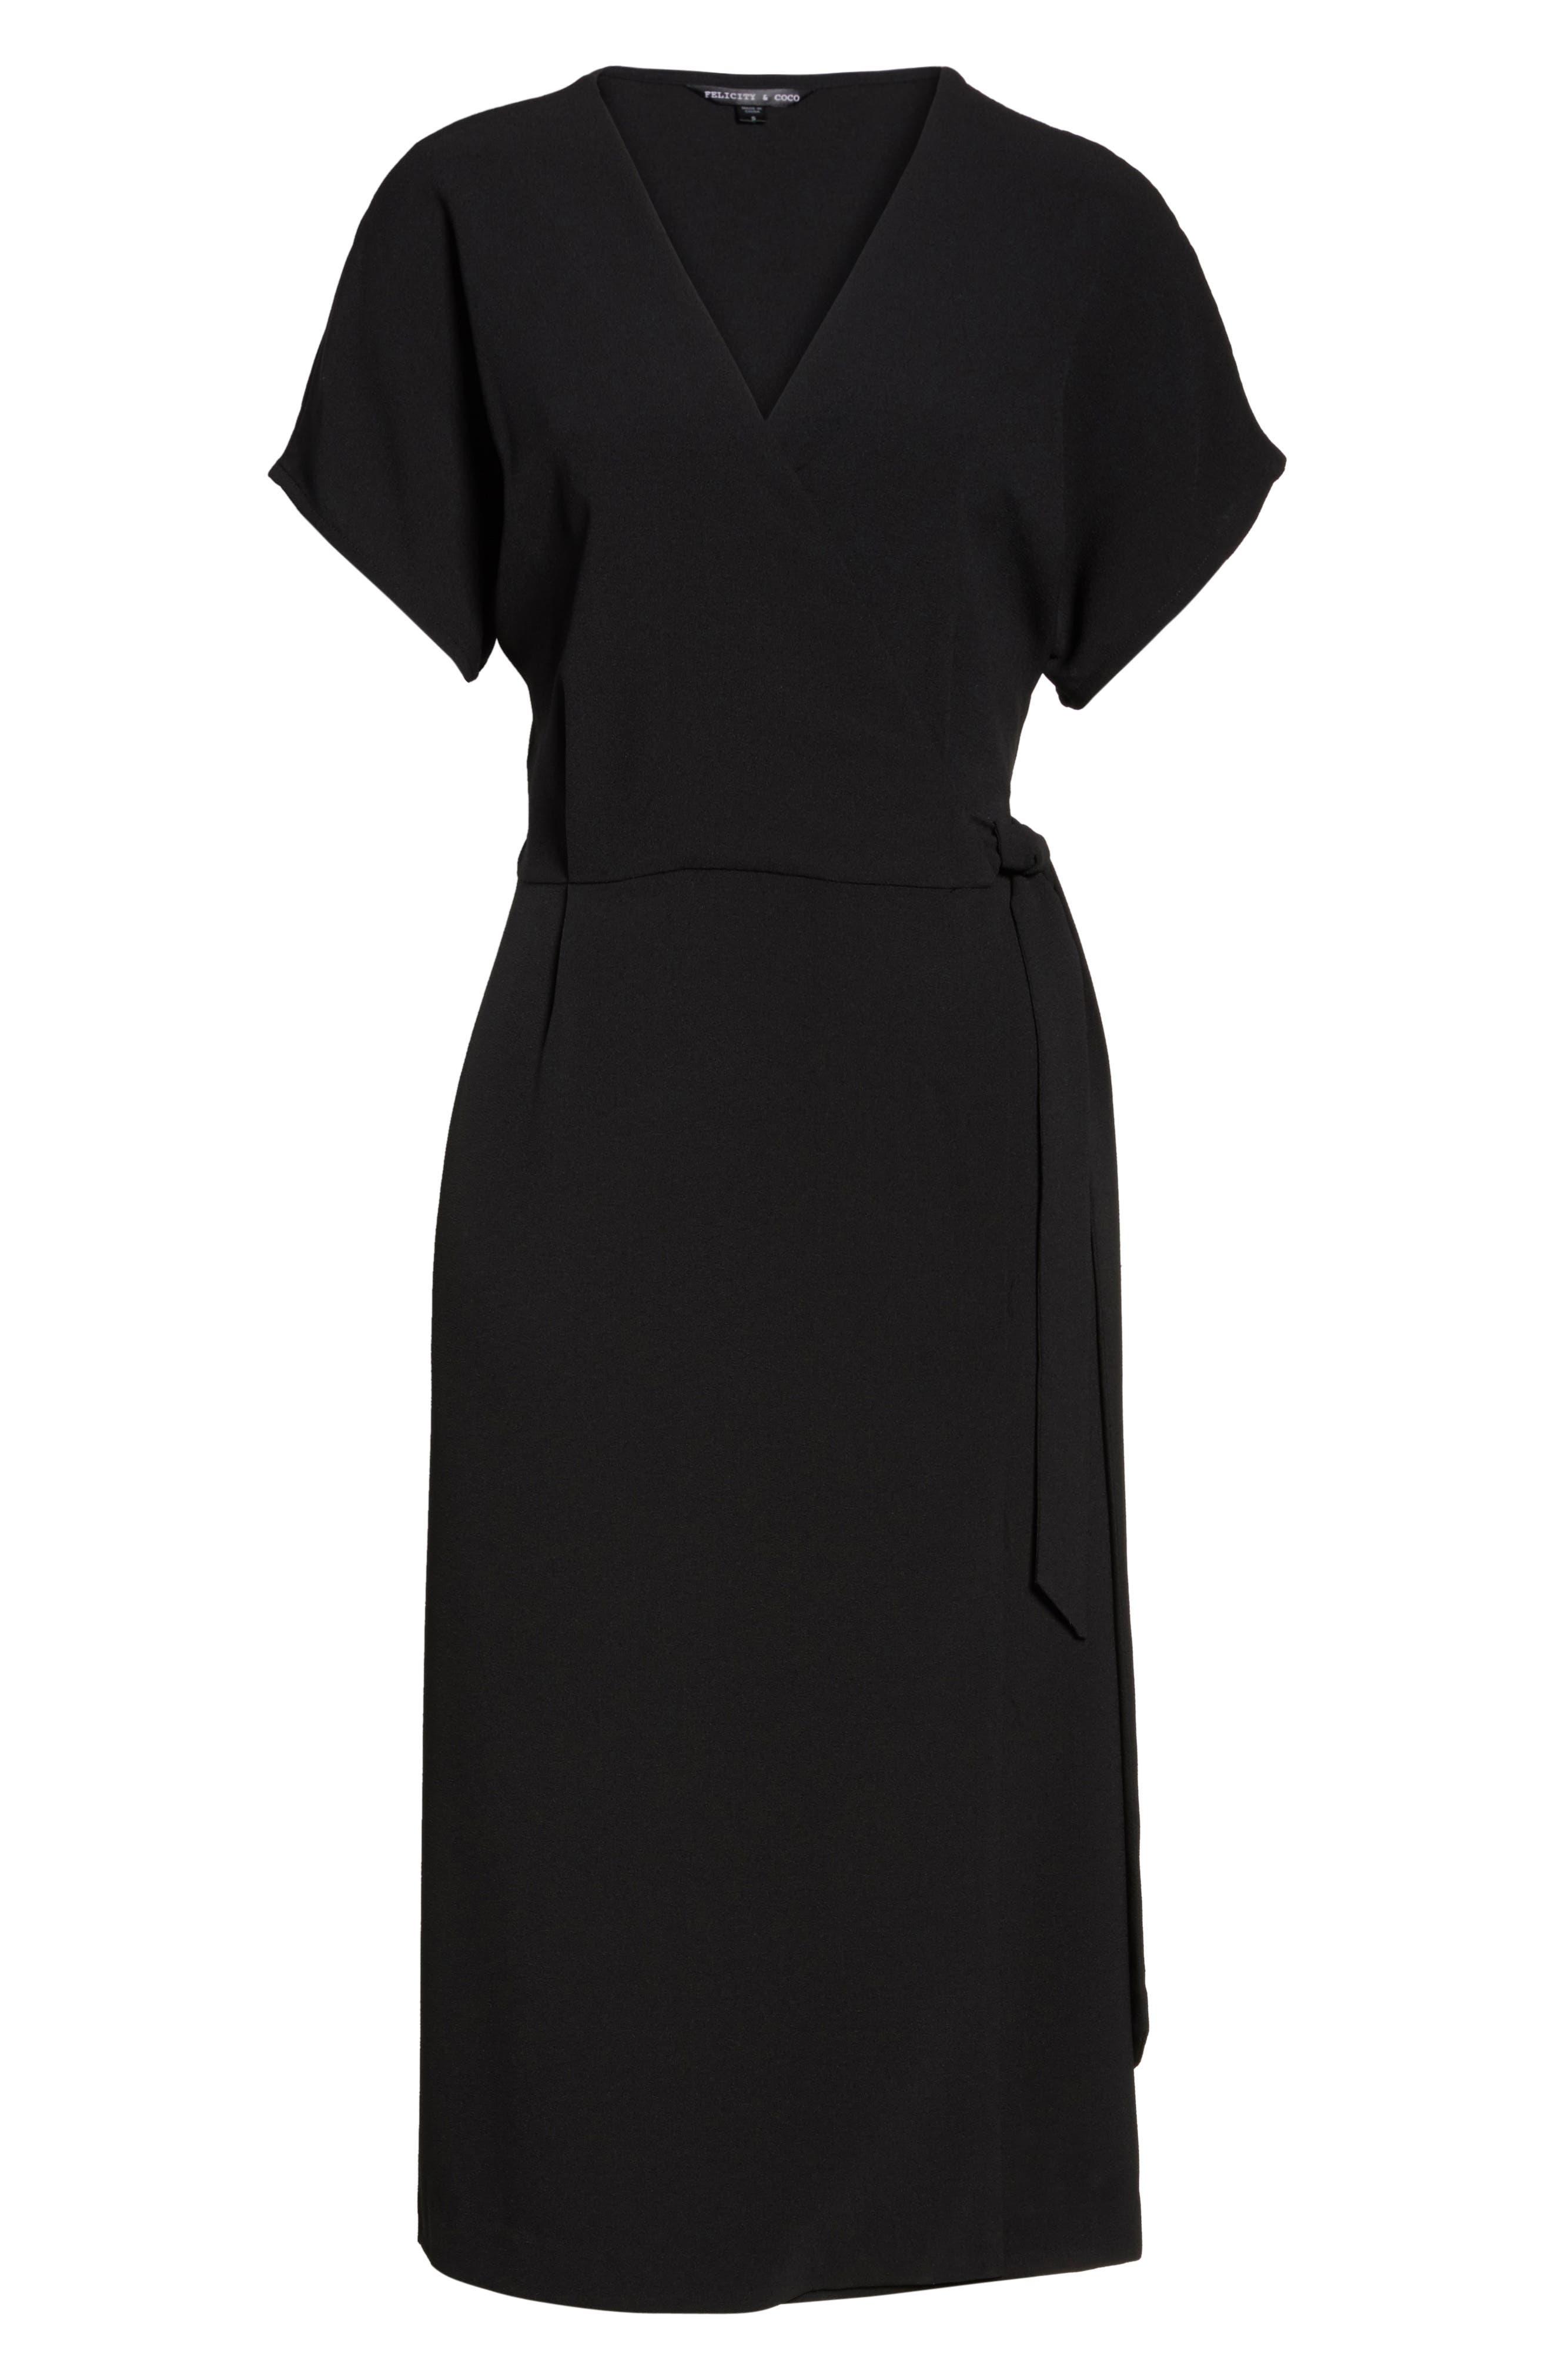 FELICITY & COCO, Rita Wrap Dress, Alternate thumbnail 8, color, BLACK